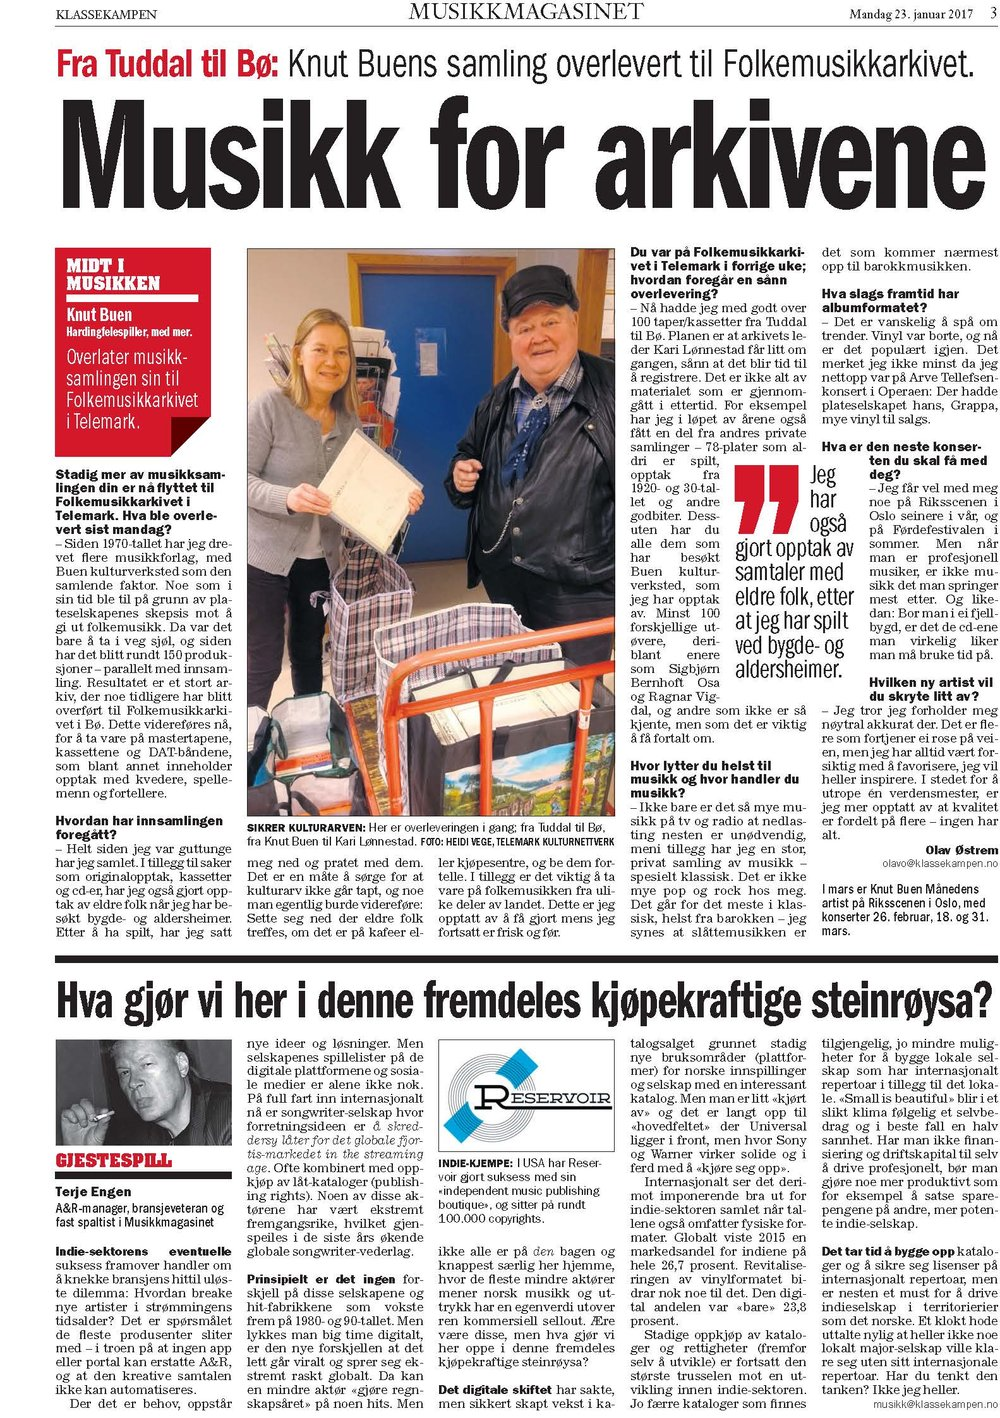 Klassekampen-Bilag-2017-01-23-side-3-Knut Buen.jpg